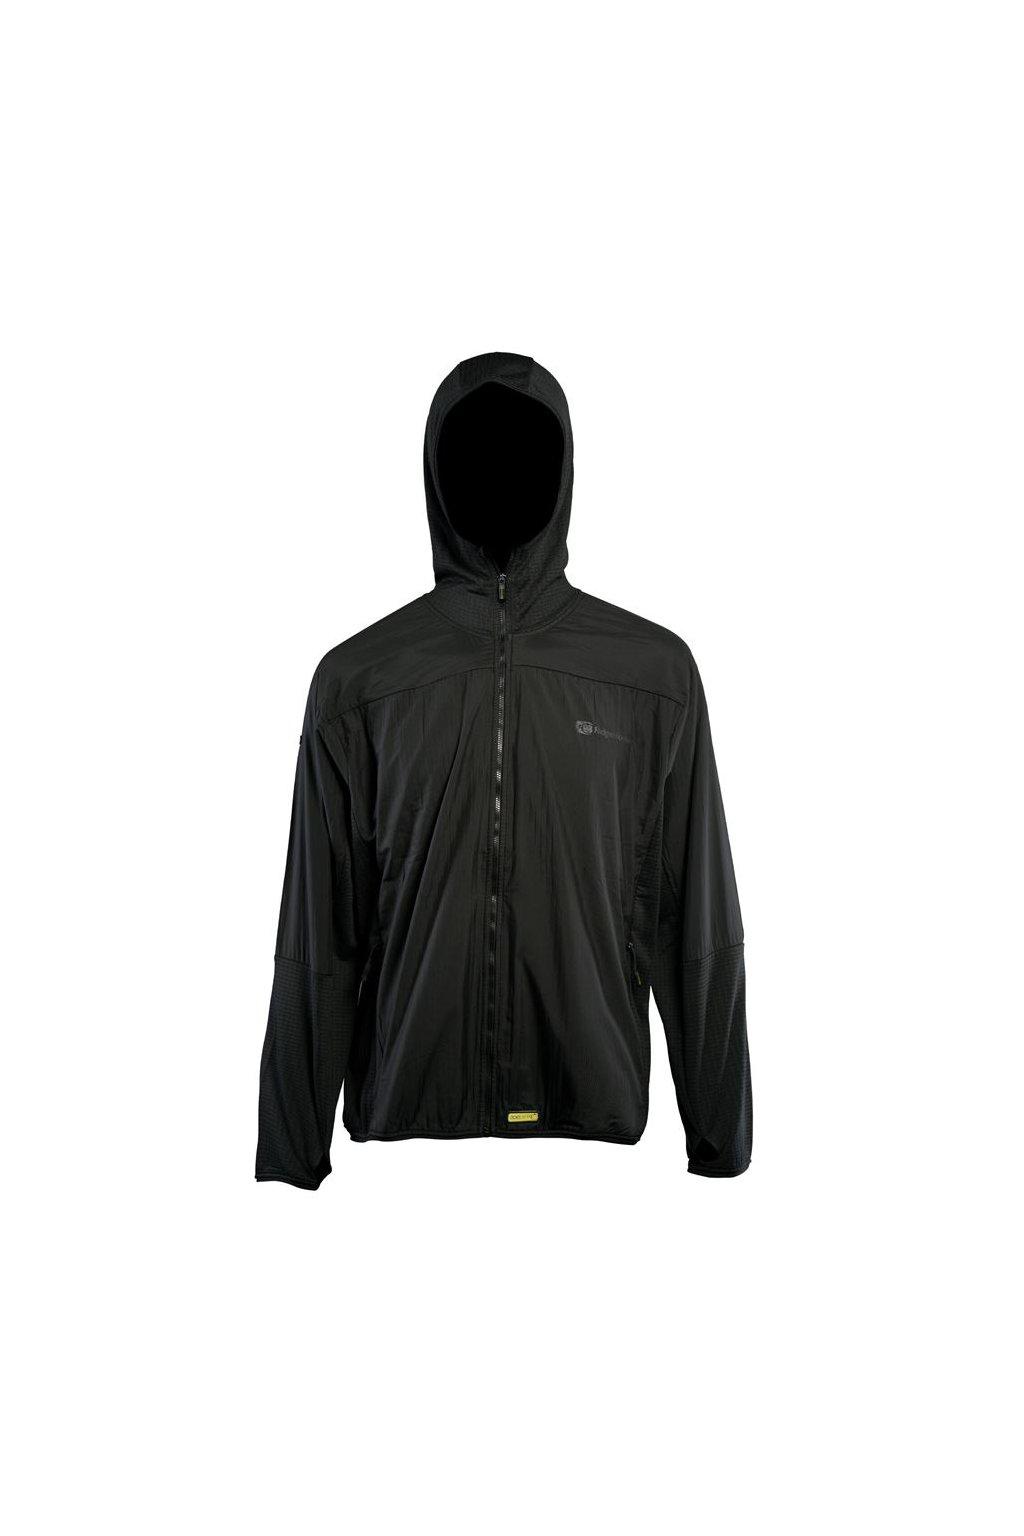 RidgeMonkey Bunda APEarel Dropback Lightweight Zip Jacket Black